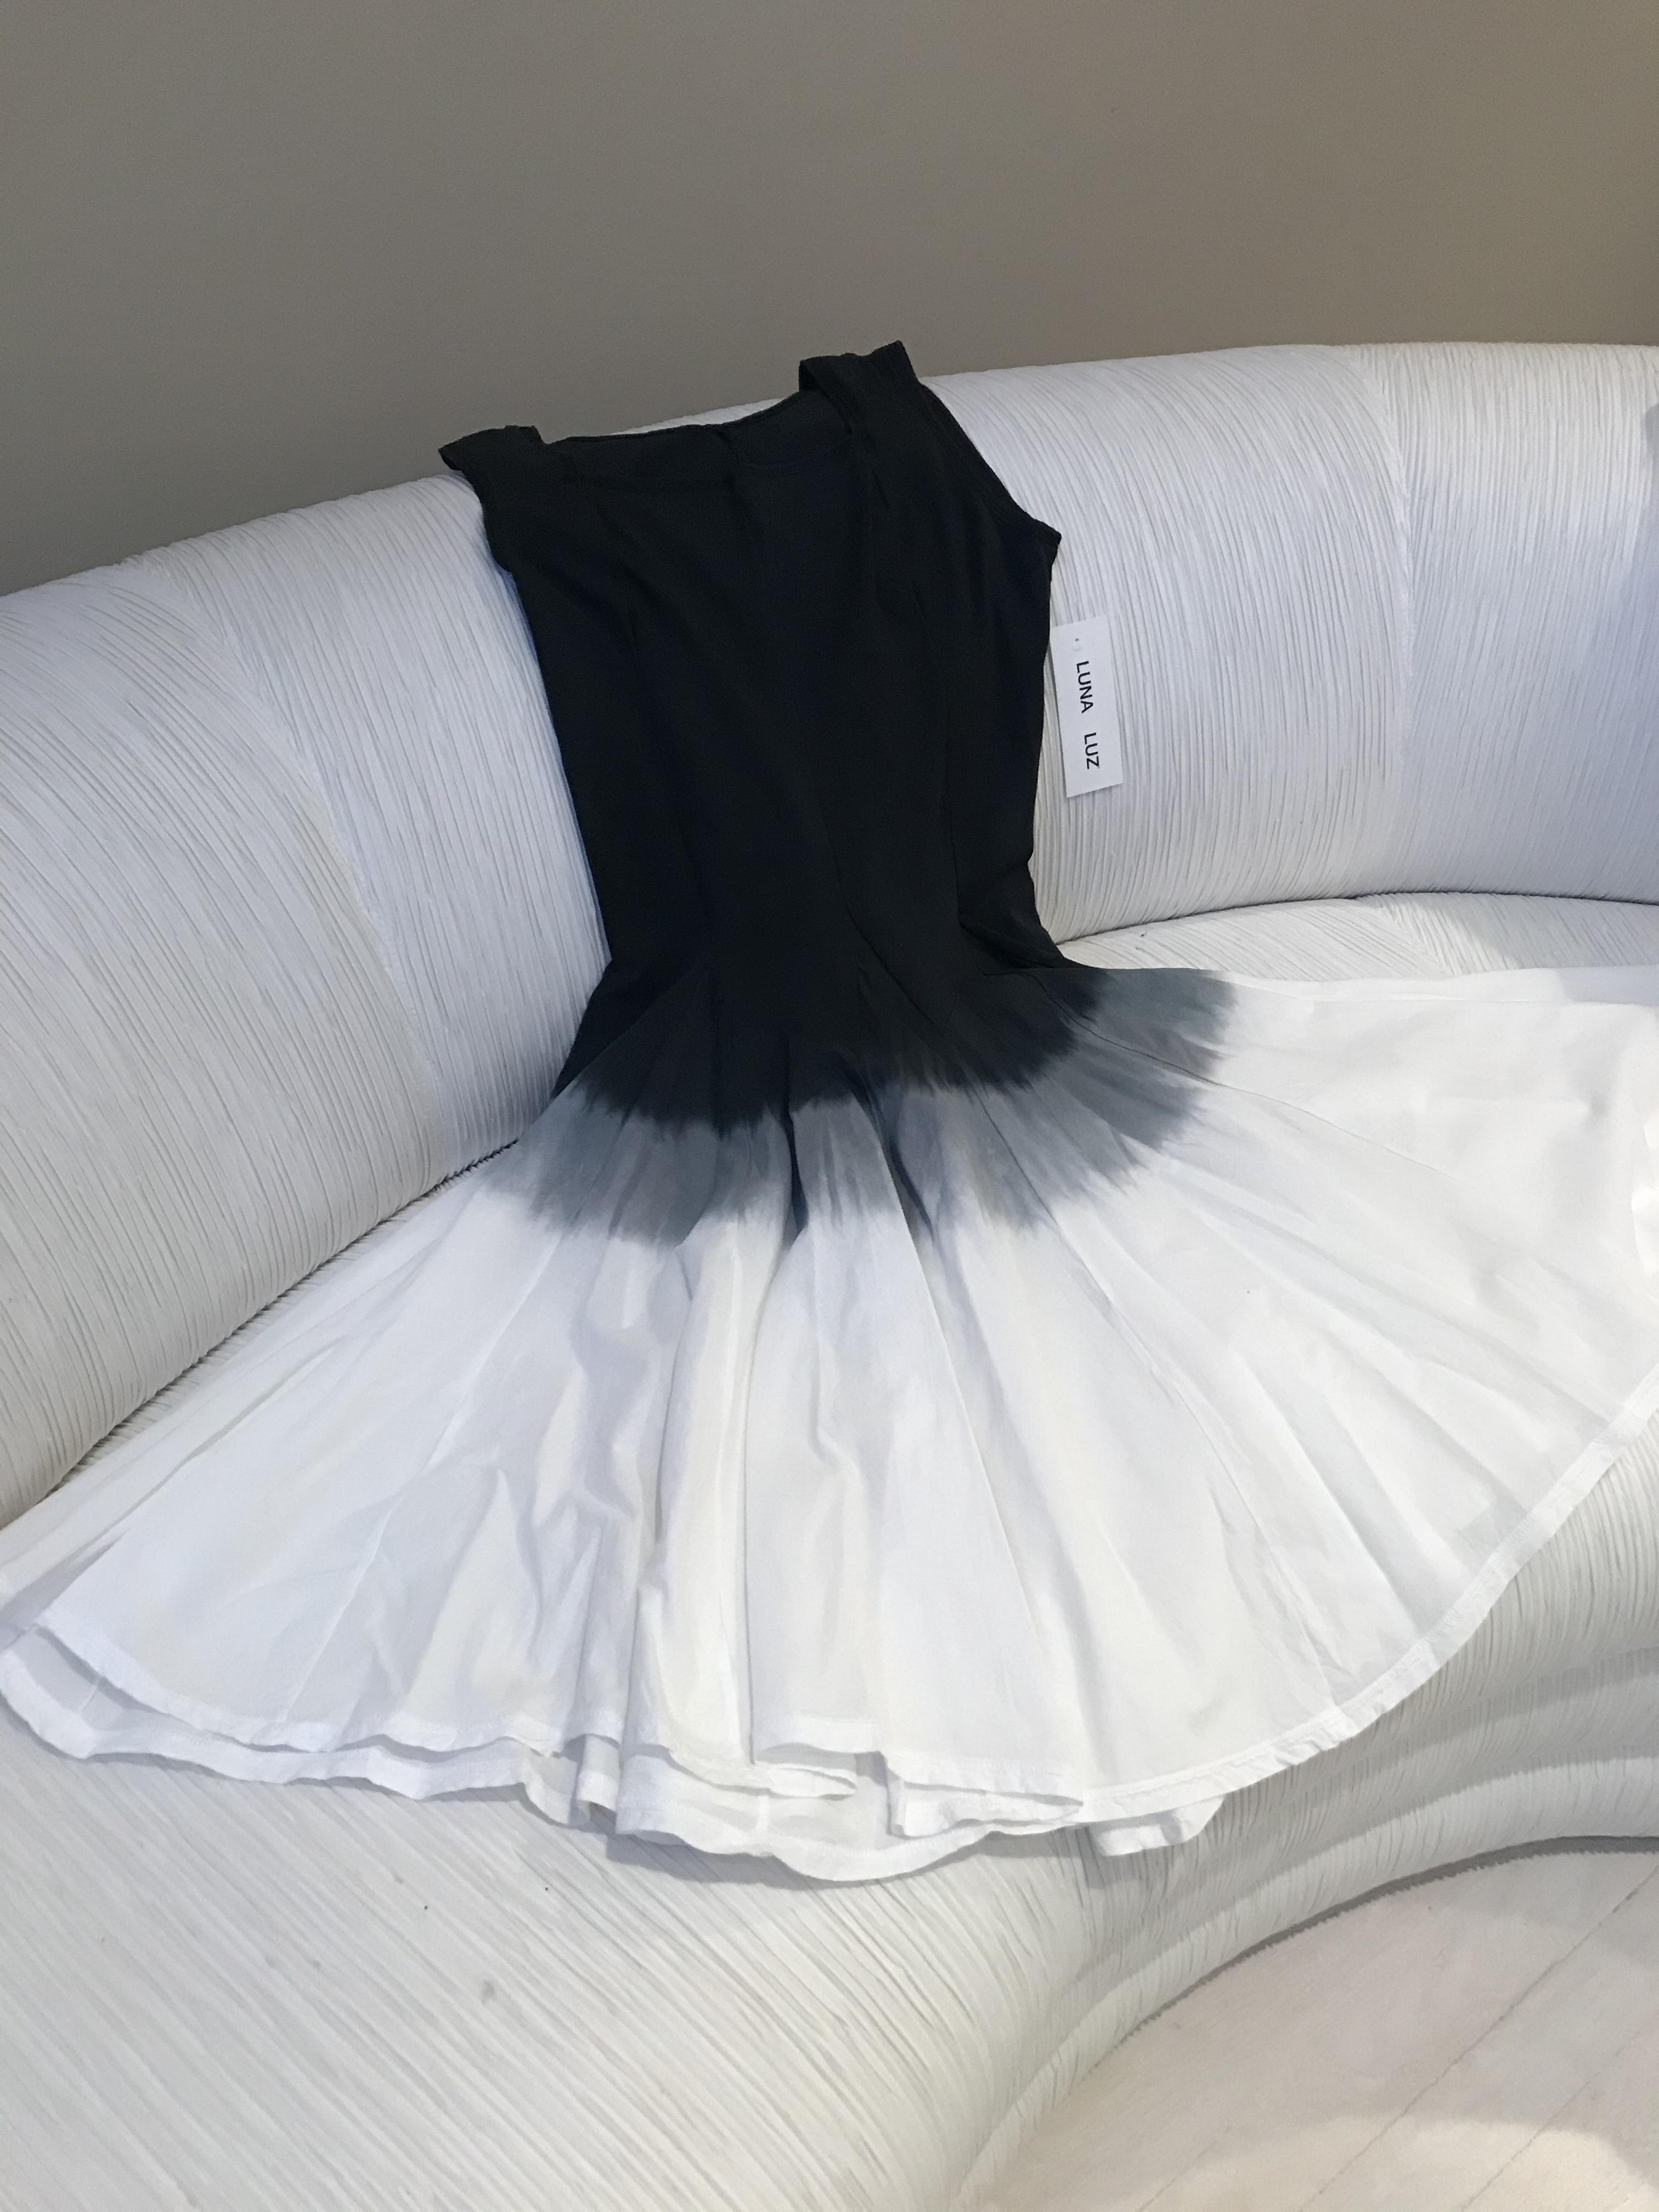 Luna Luz: Square Neck Godet Dyed Tank Dress SOLD OUT LL_5533_blk_ombre